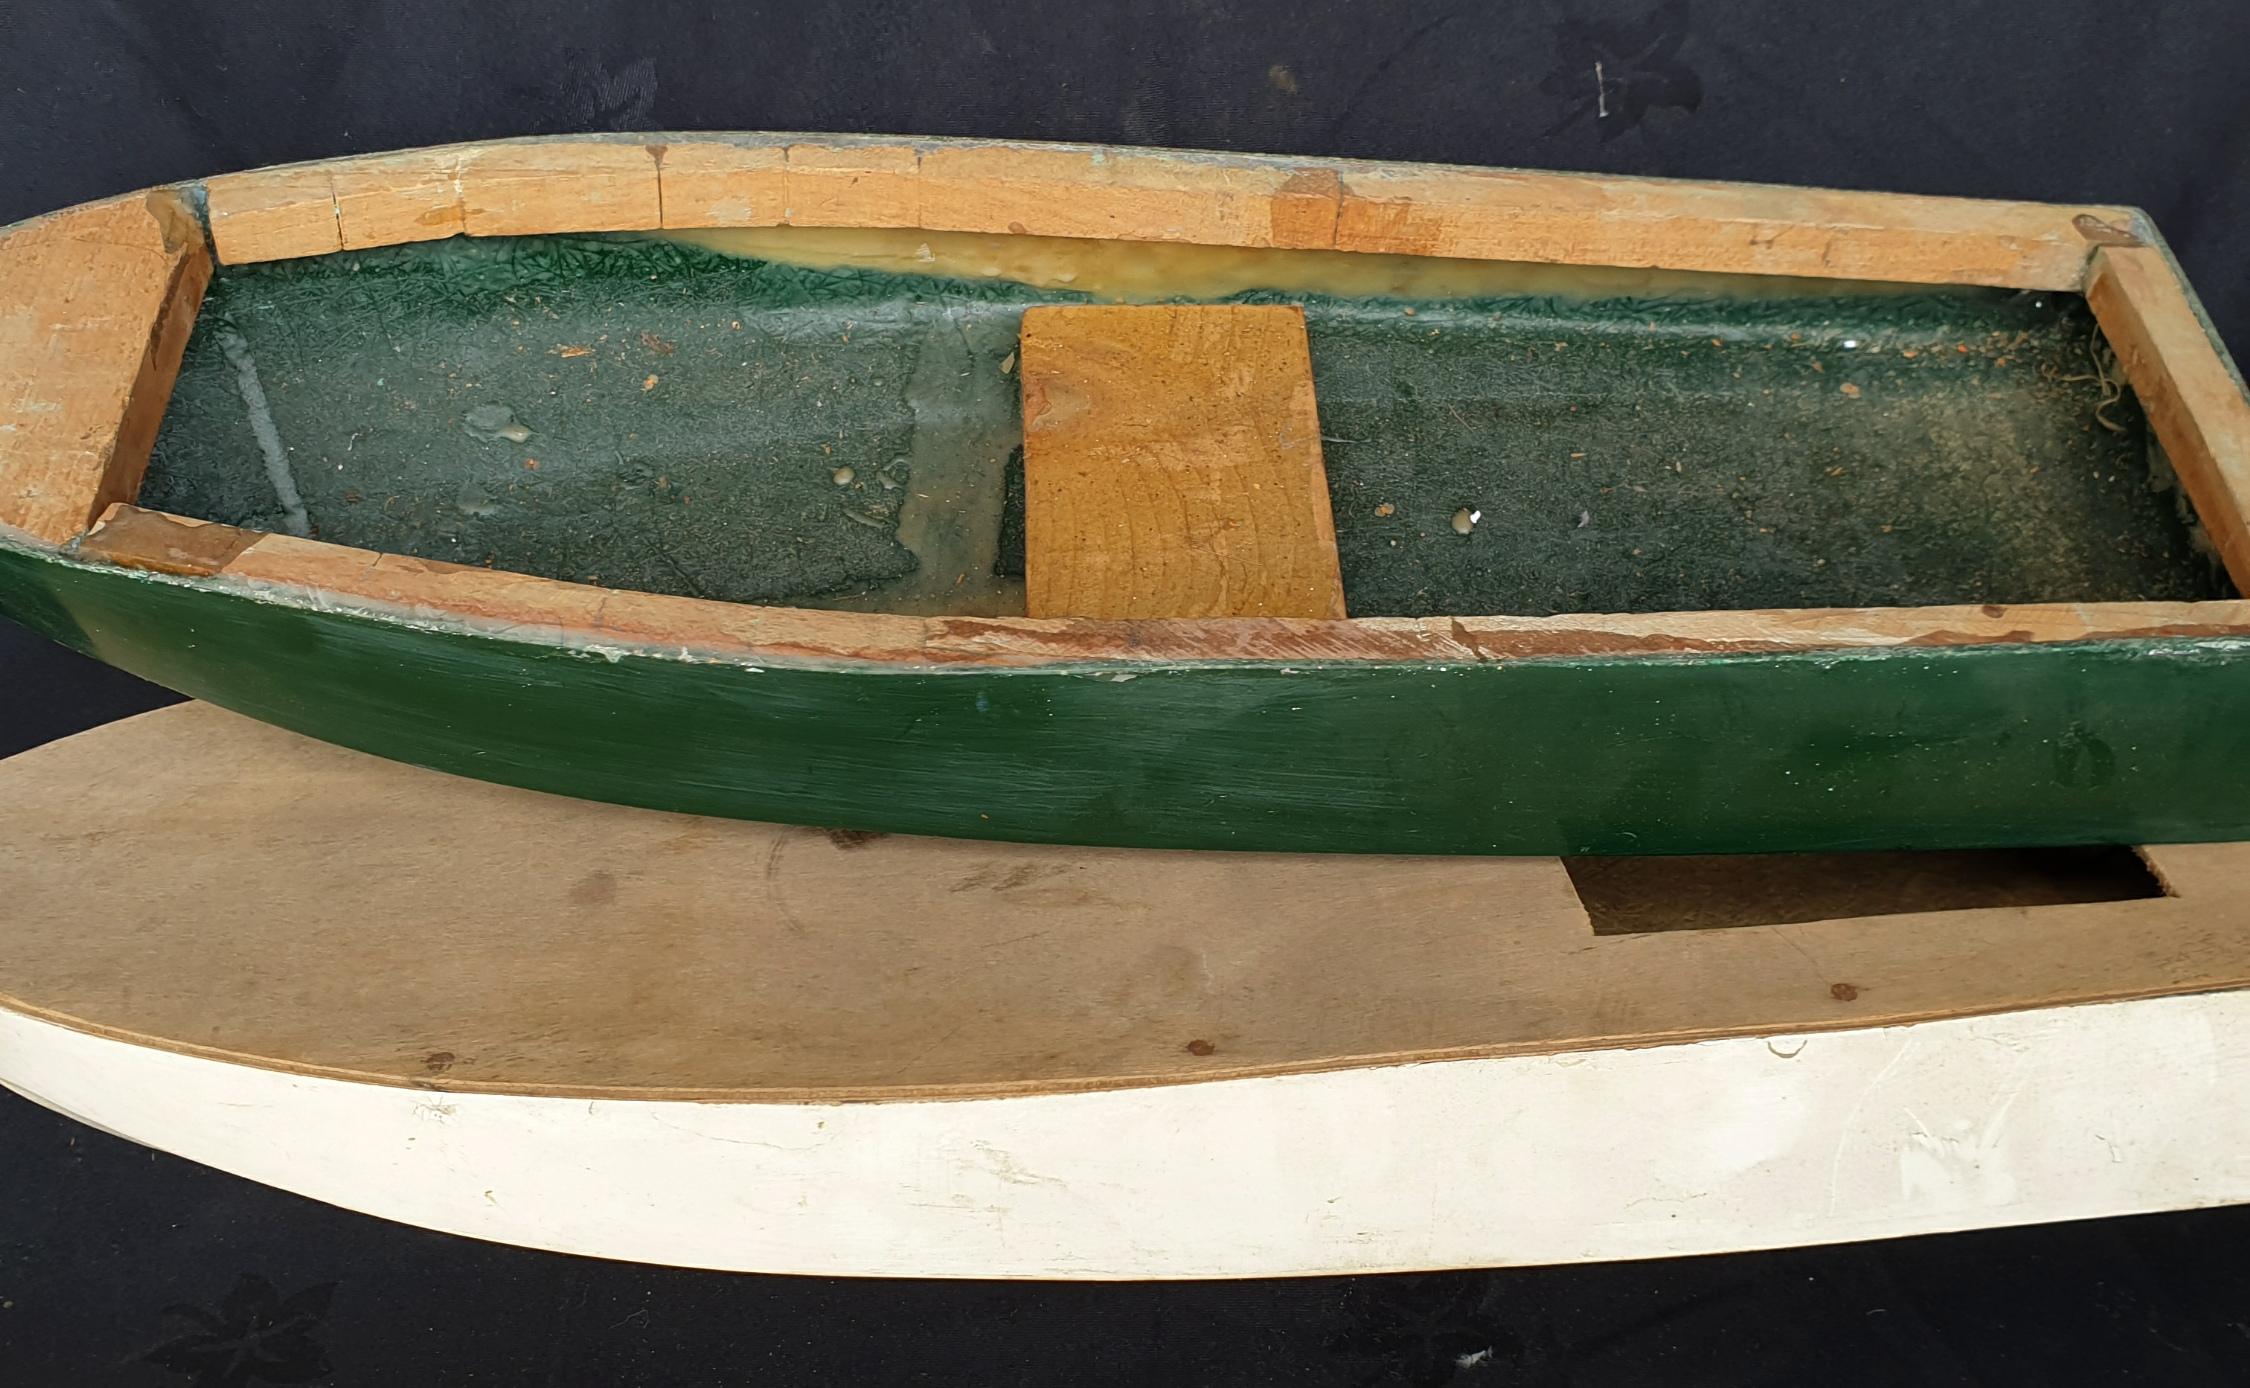 Vintage 2 x Fibre Glass & Wood Boat Hulls - Image 2 of 2